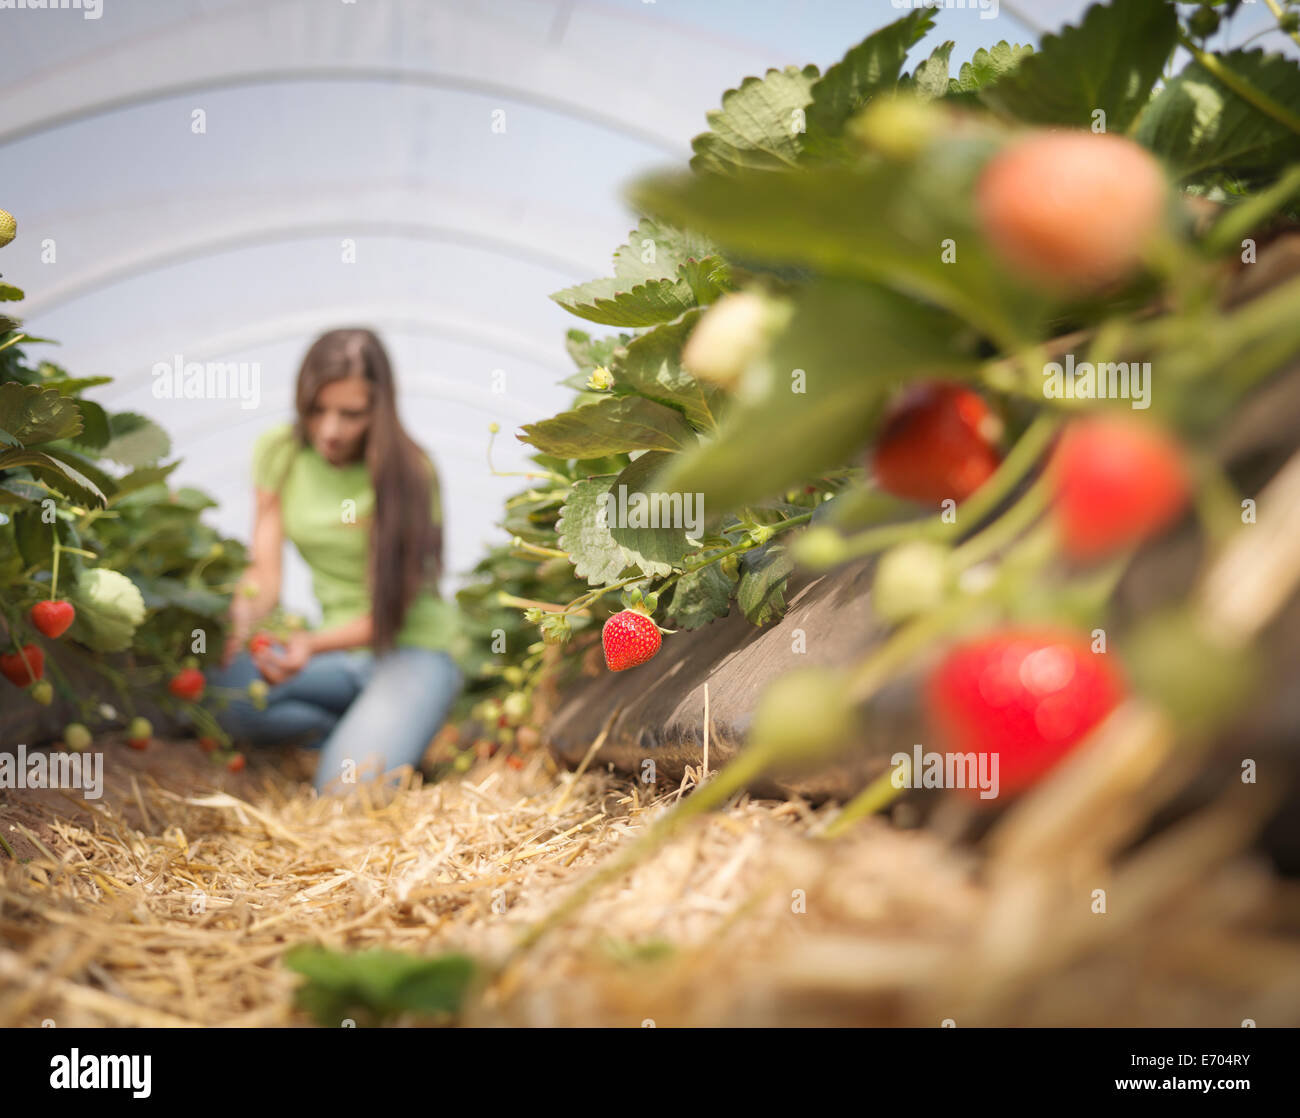 Worker picking strawberries in fruit farm - Stock Image